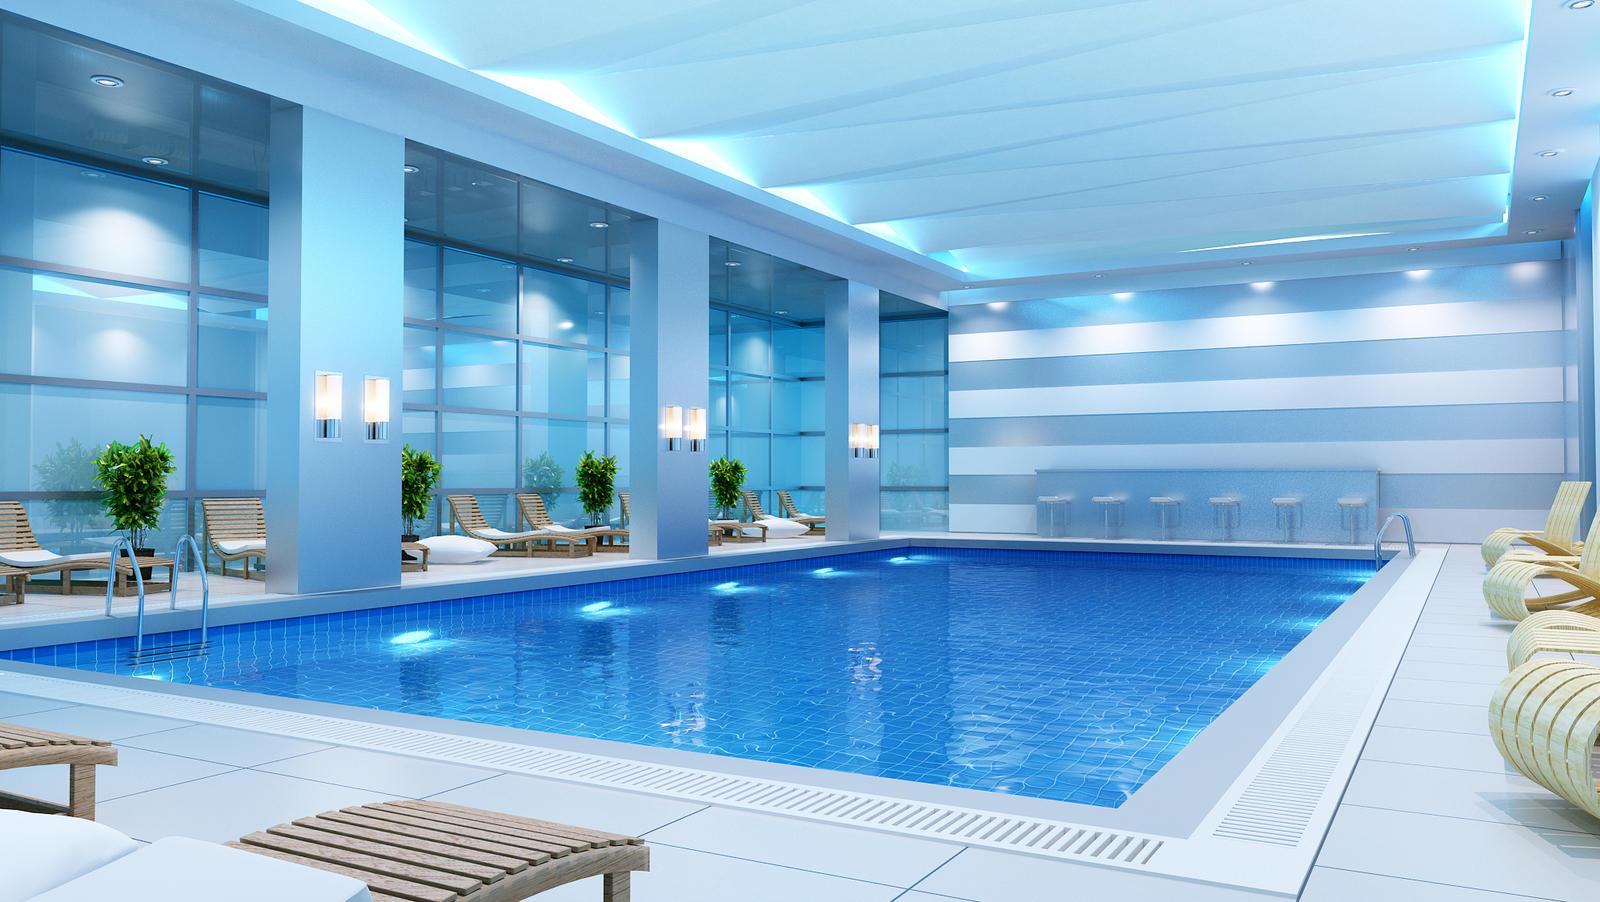 swimming pool design by tolcha on deviantart. Black Bedroom Furniture Sets. Home Design Ideas